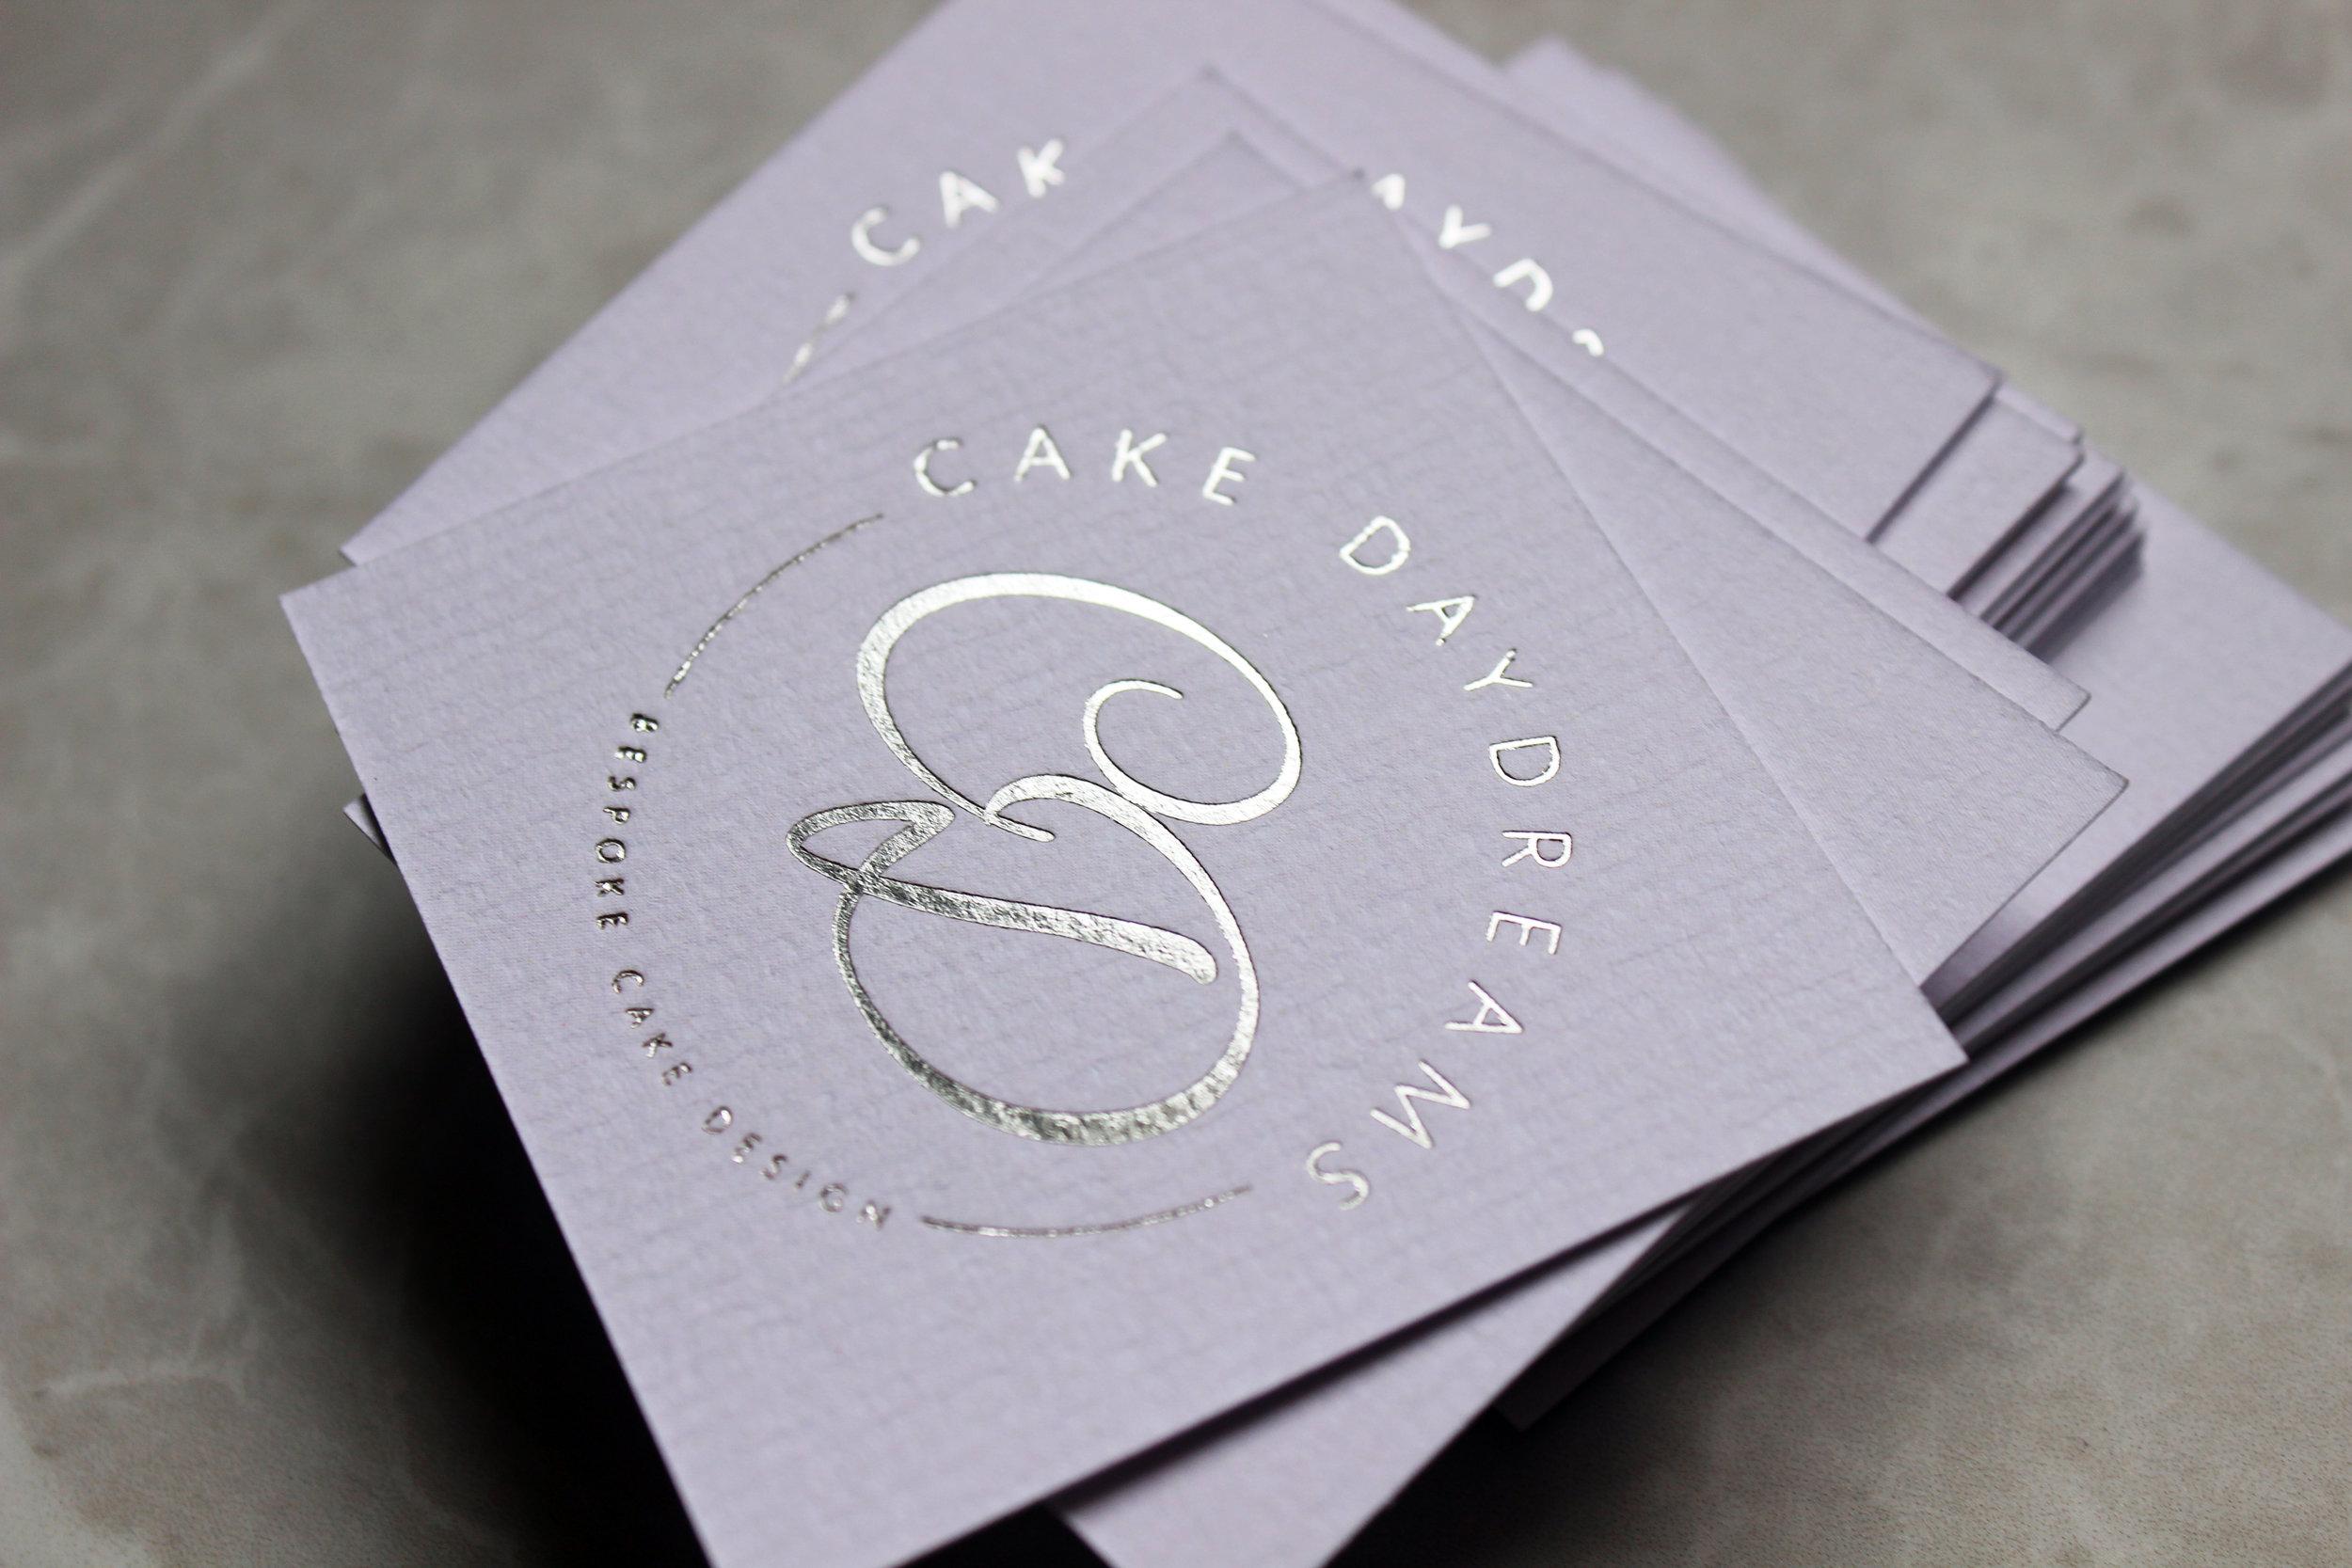 Cake Daydreams Stationery